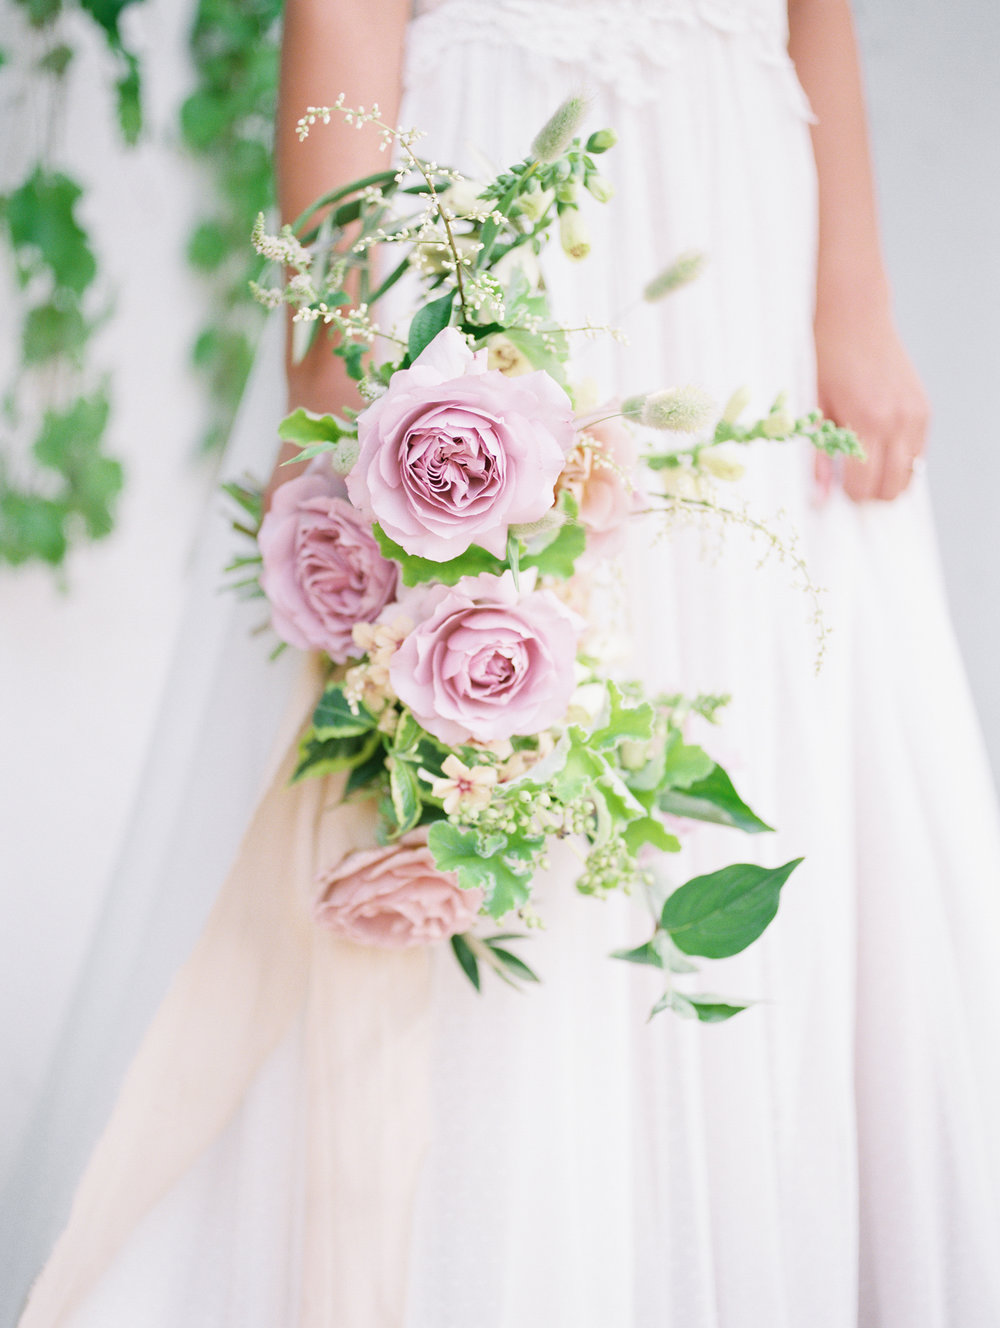 Monet Vineyards Washington Wedding With Lavender Peach And Blush